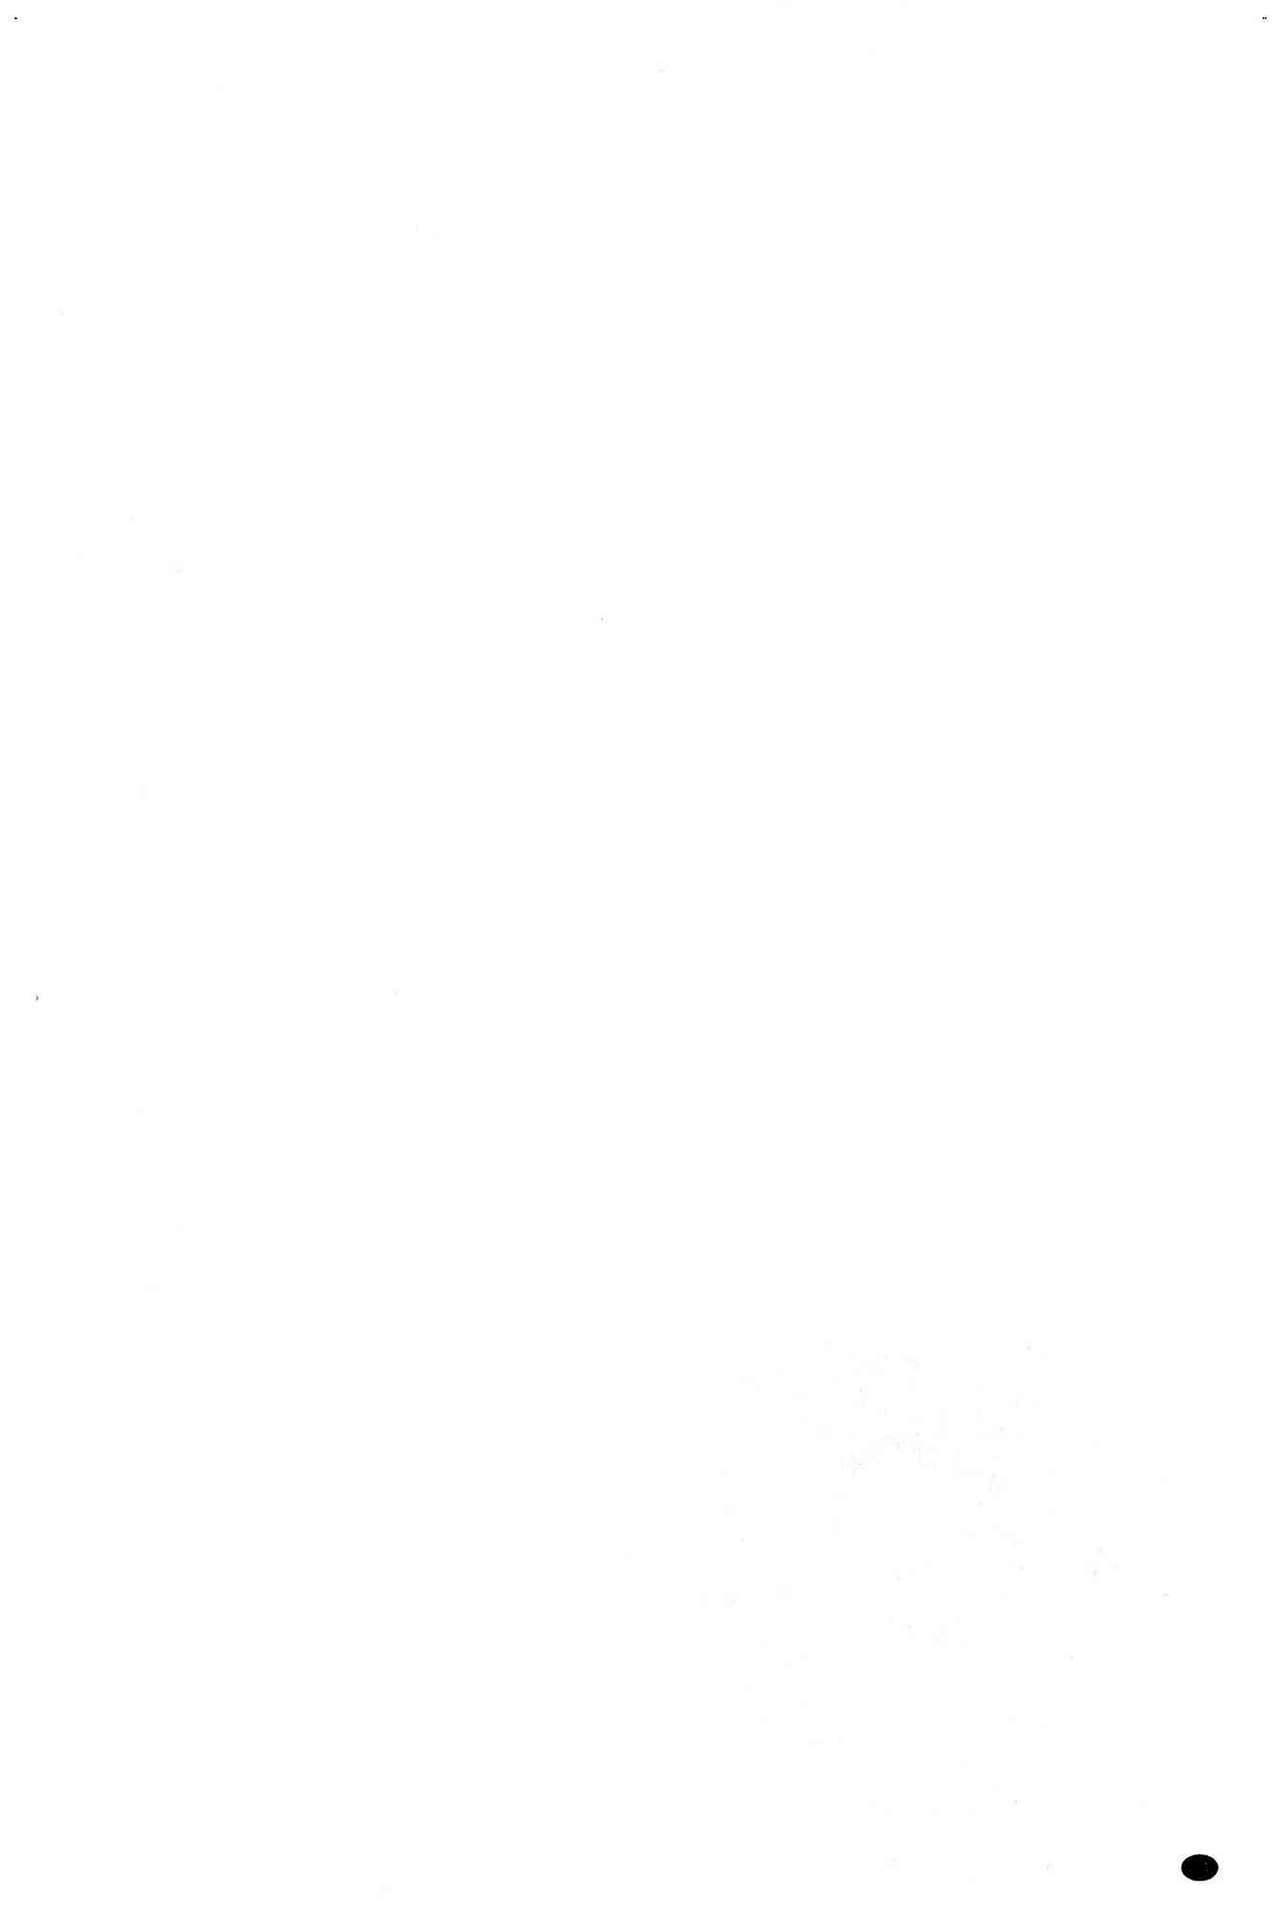 [Gotoh Akira]  21-ji no Onna ~Camera no Mae no Mesuinu~ 2 | 21時之女 ~鏡頭前的牝犬~ 2 [Chinese] 25